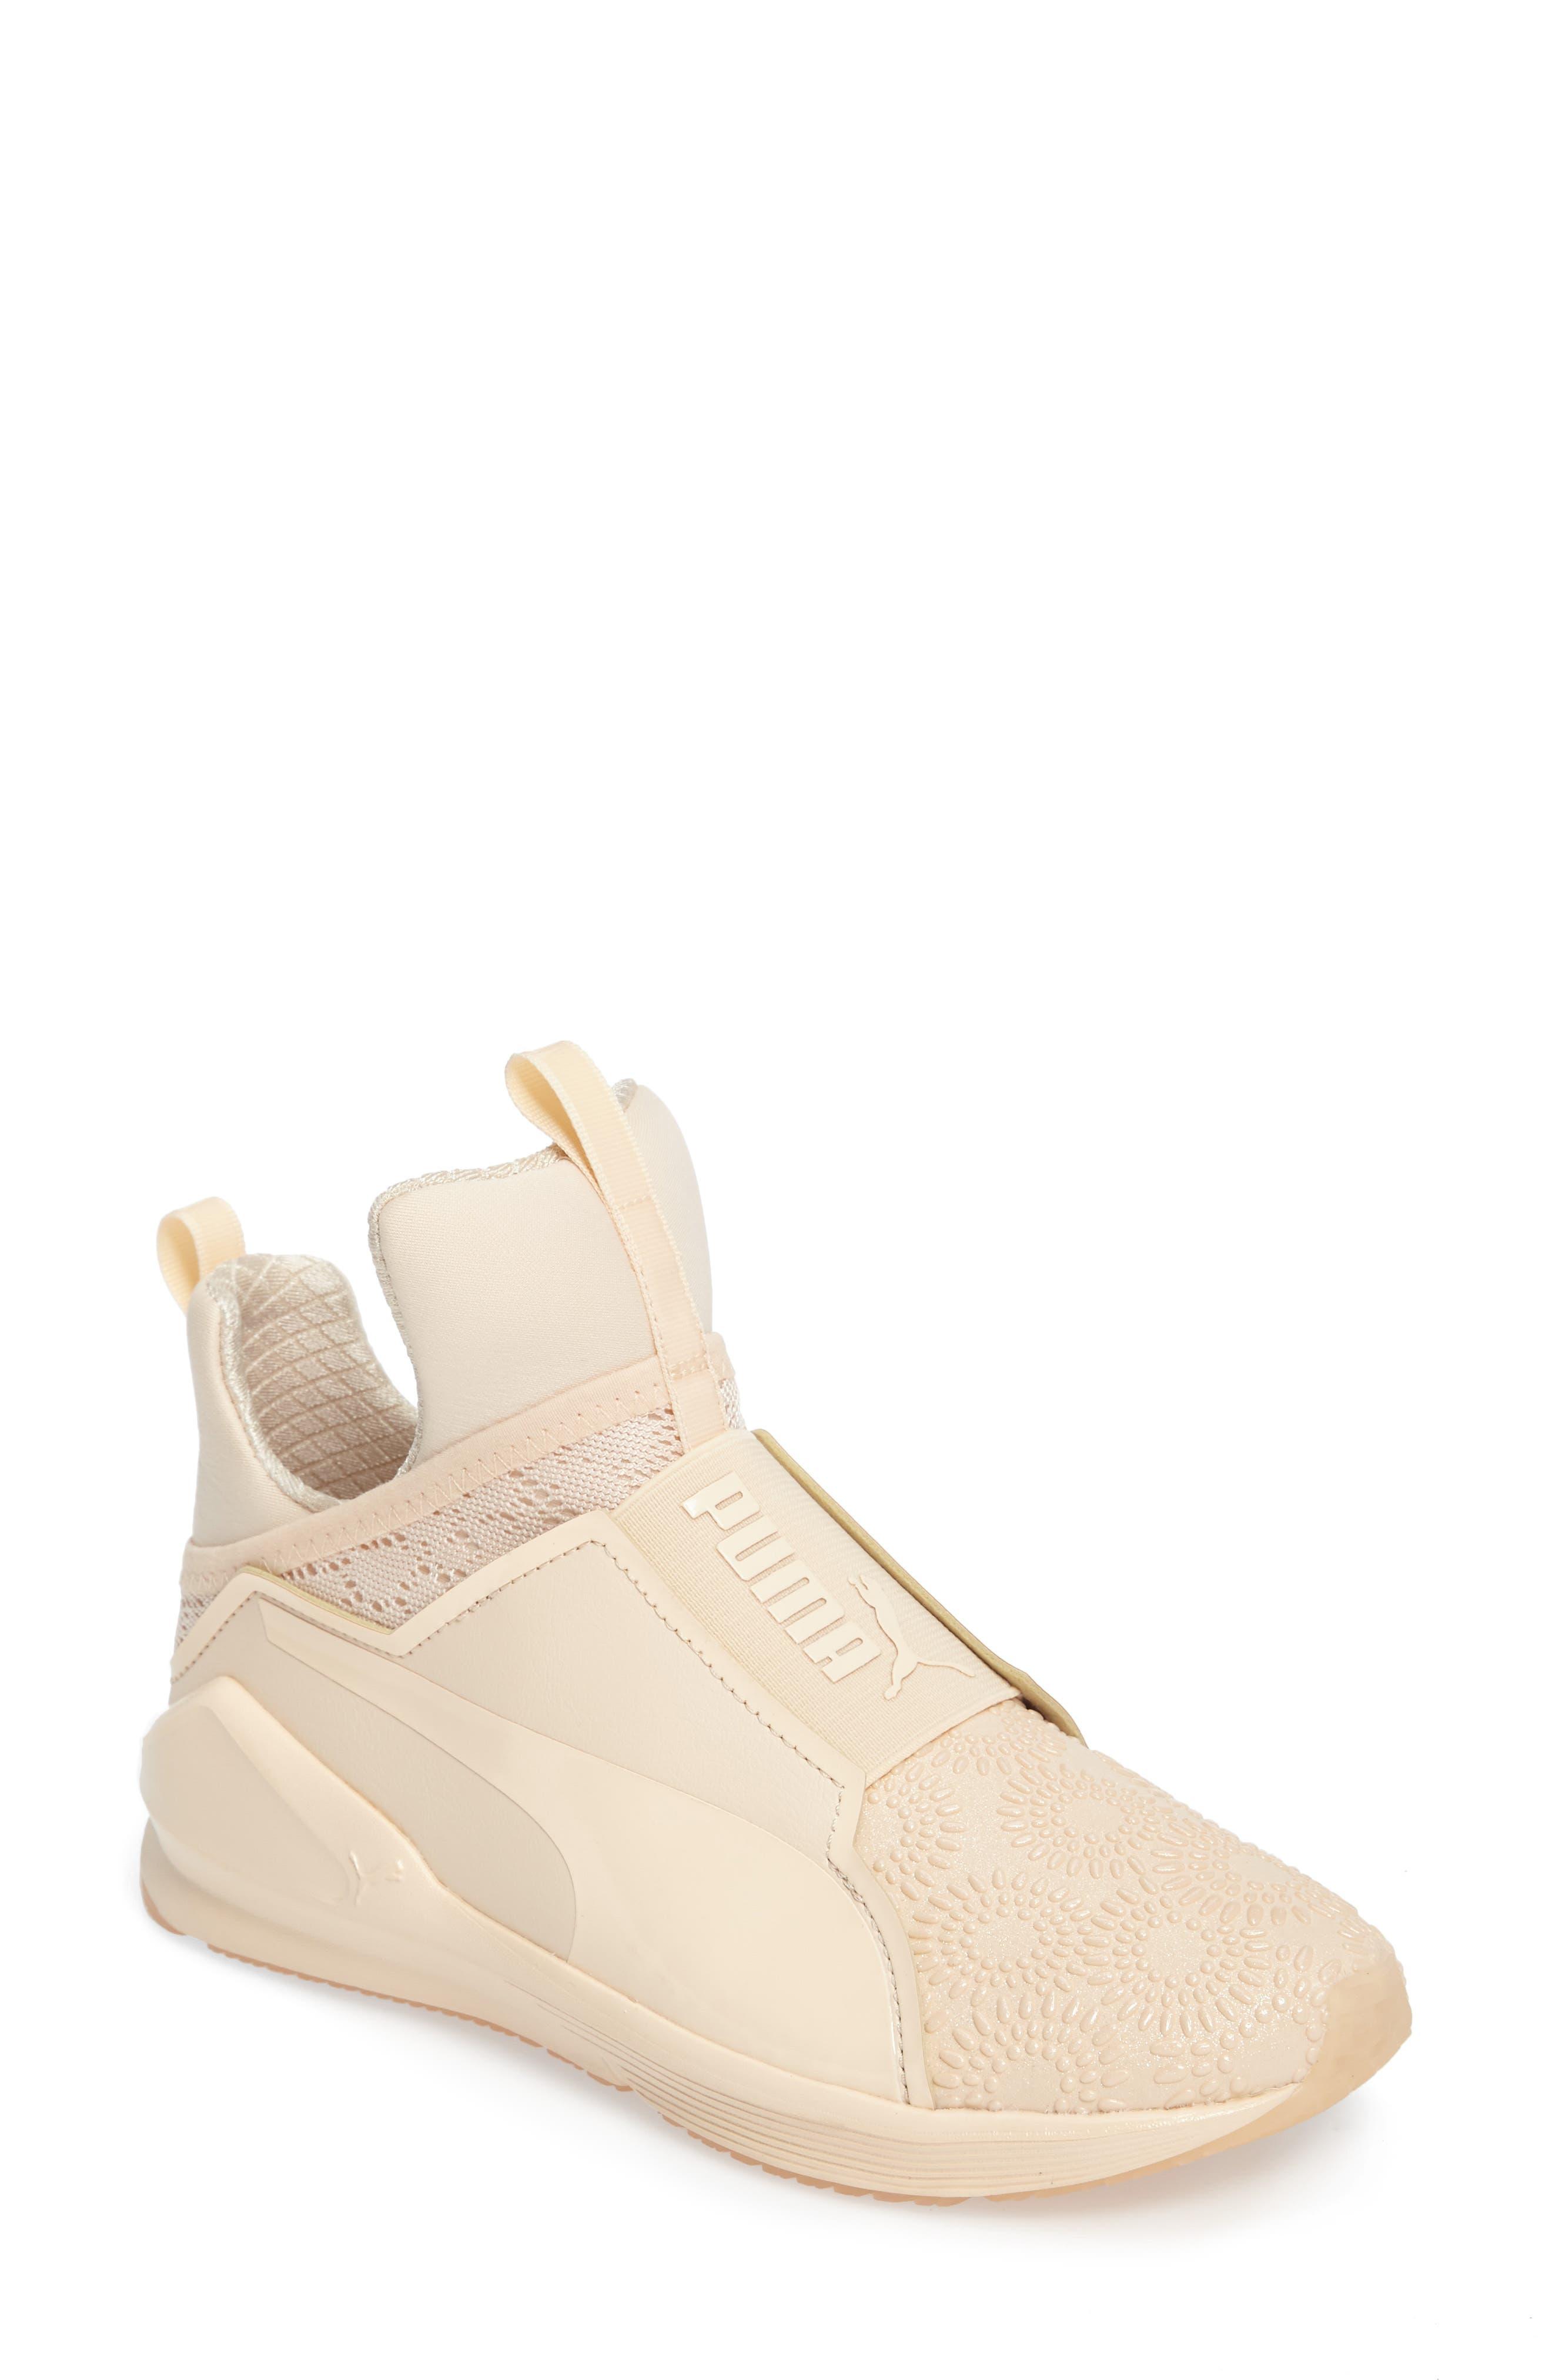 Main Image - PUMA Fierce KRM High Top Sneaker (Women)